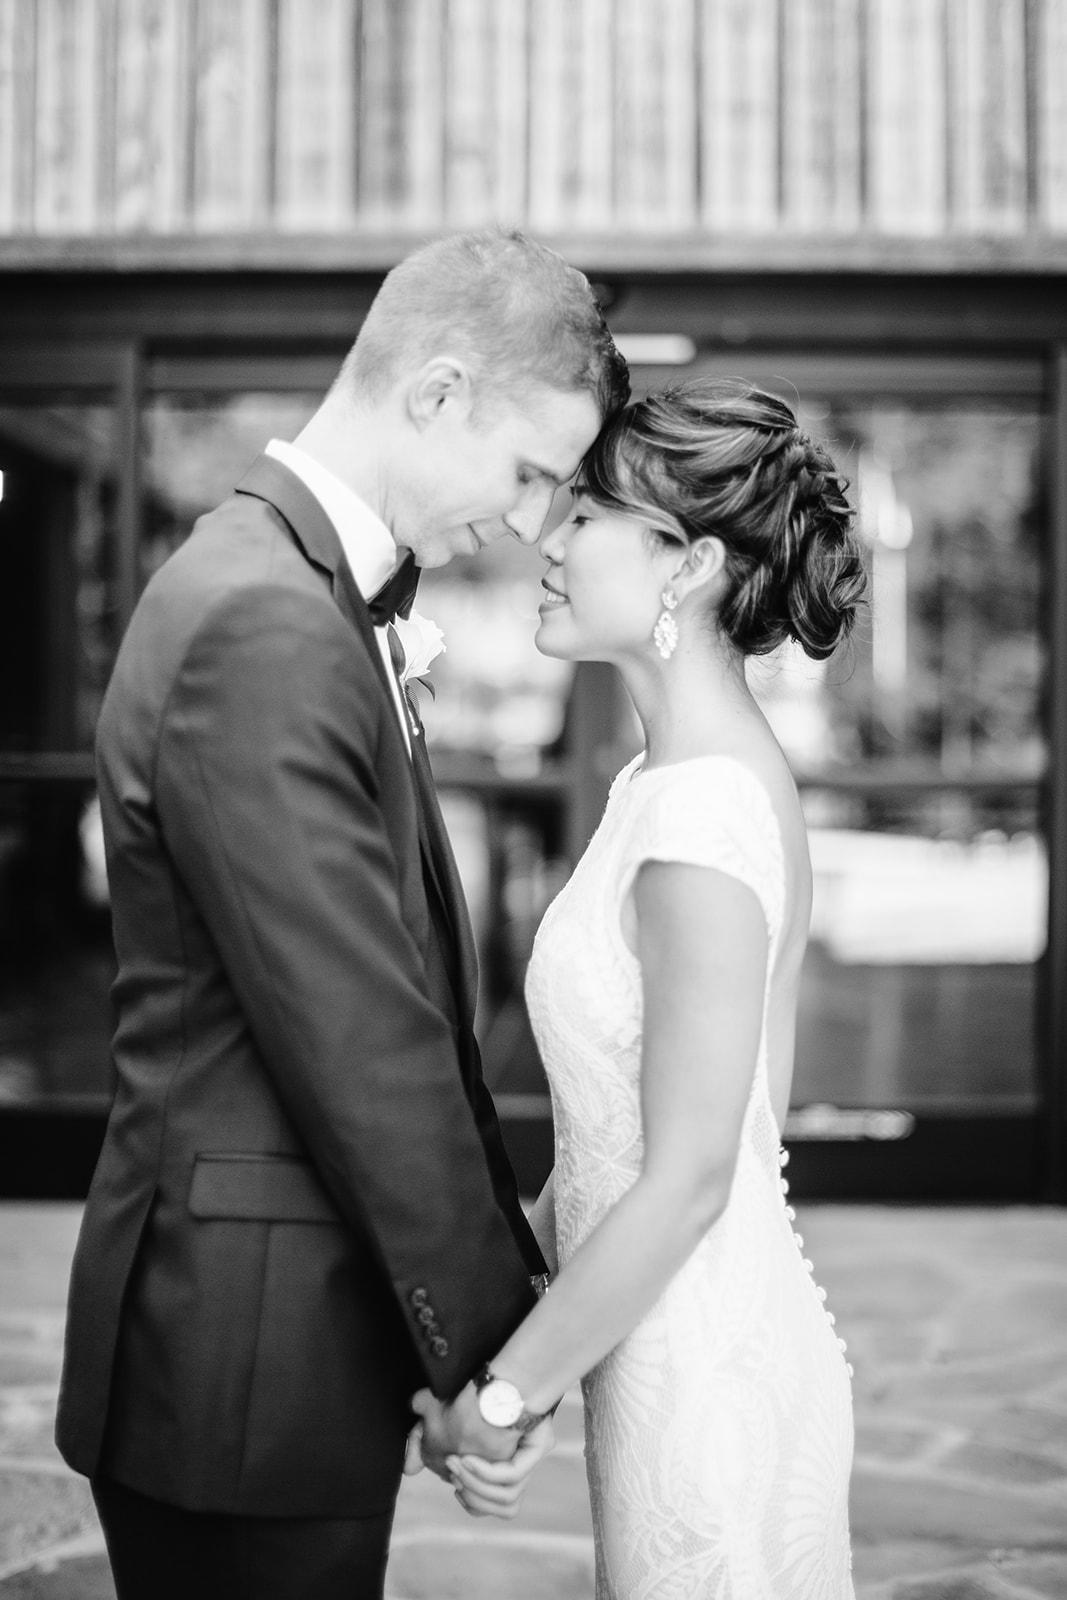 Tennessee wedding photographer Jamie Pratt Photos